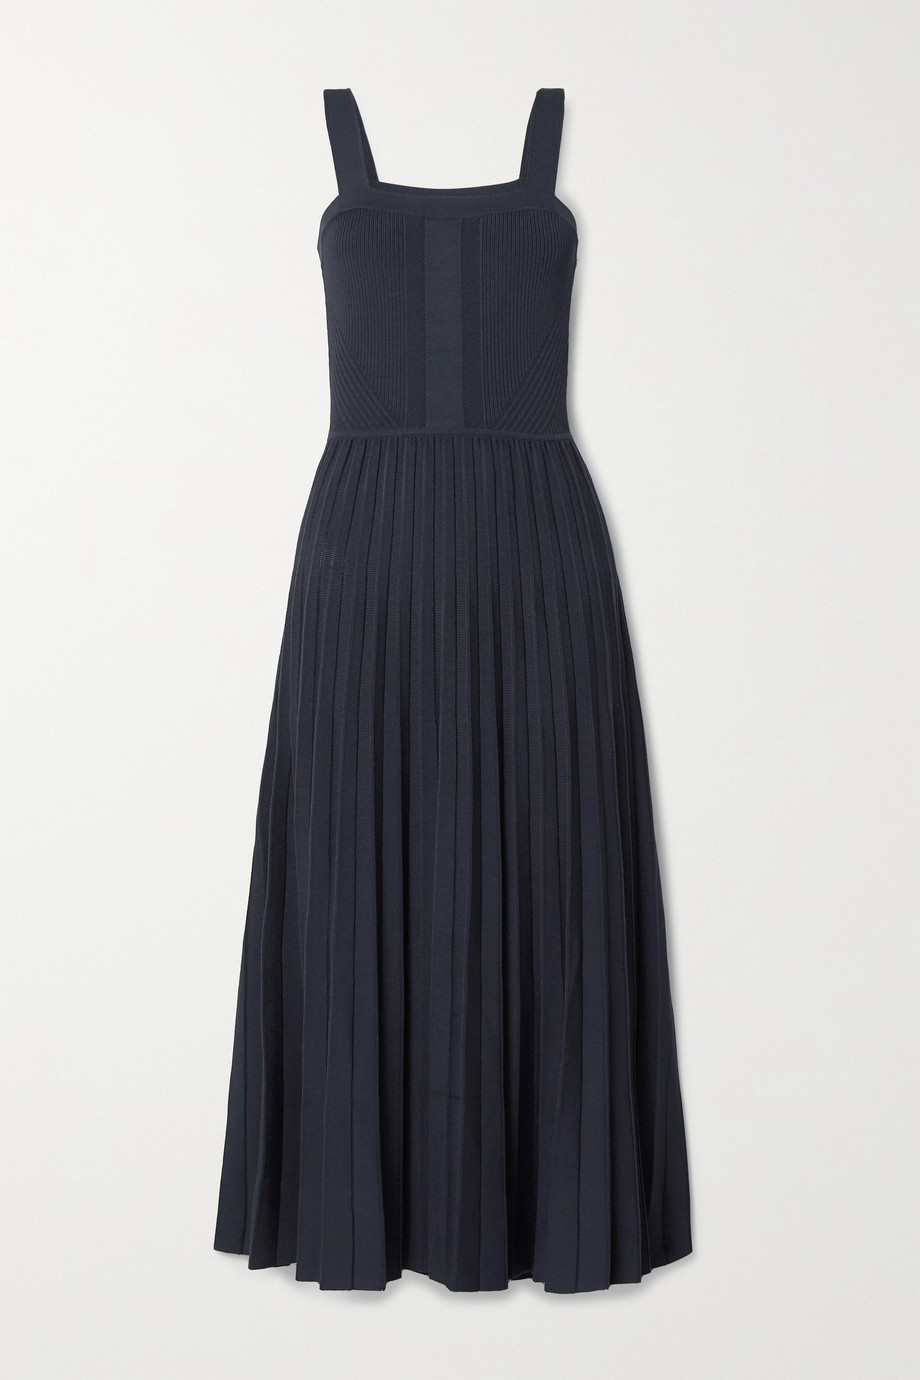 Jason Wu Collection 褶裥针织中长连衣裙